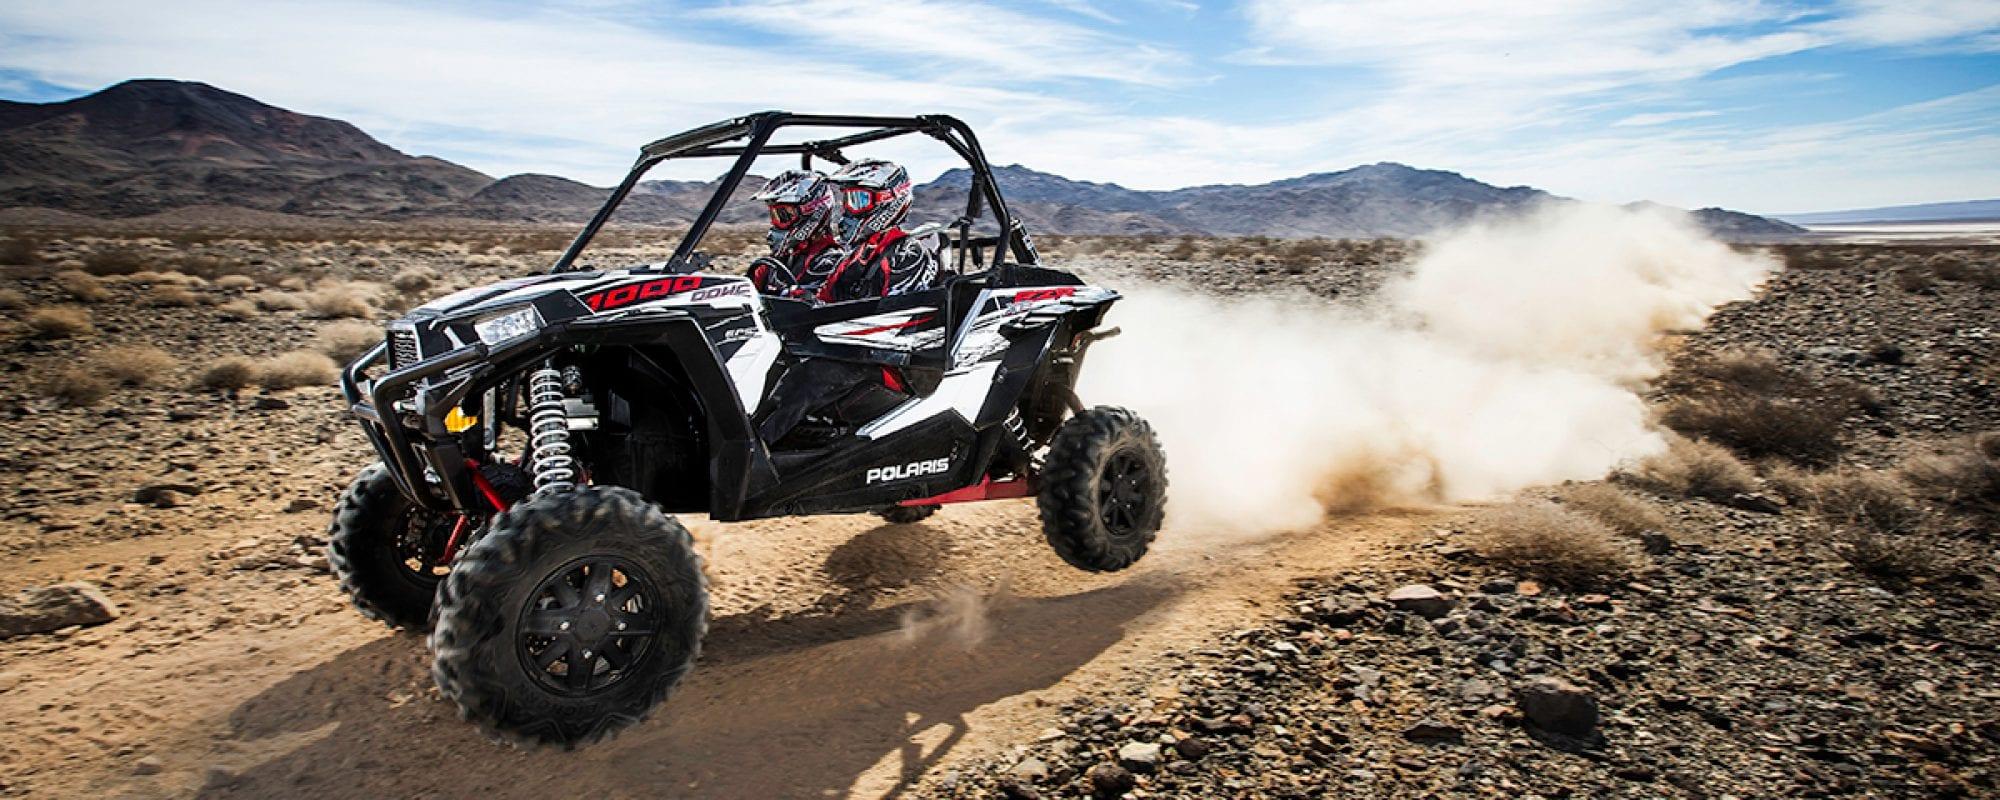 wide-open-mobile-tech-motorcycle-repair-slider-buggy